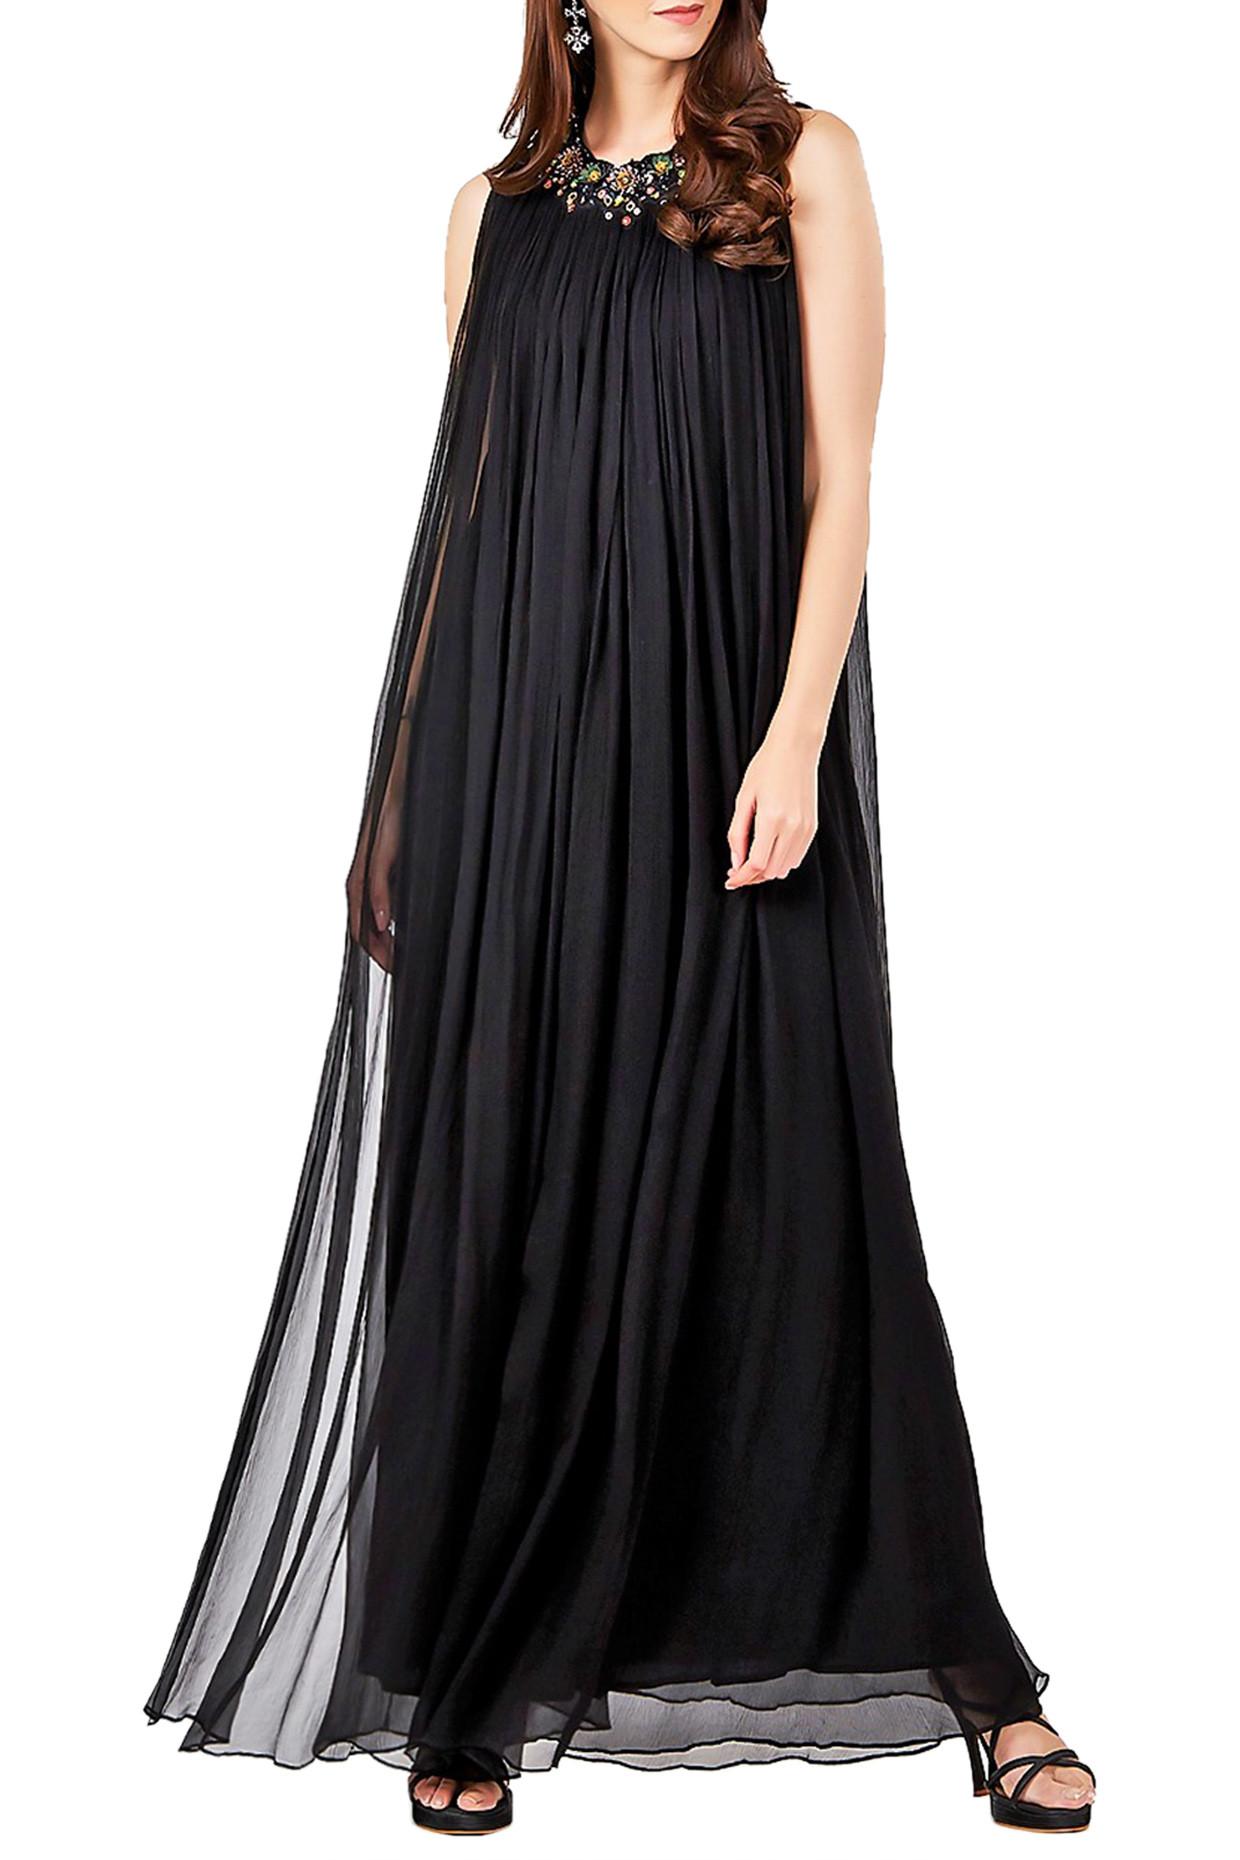 Black Embellished Long Kurta by Ritu Kumar